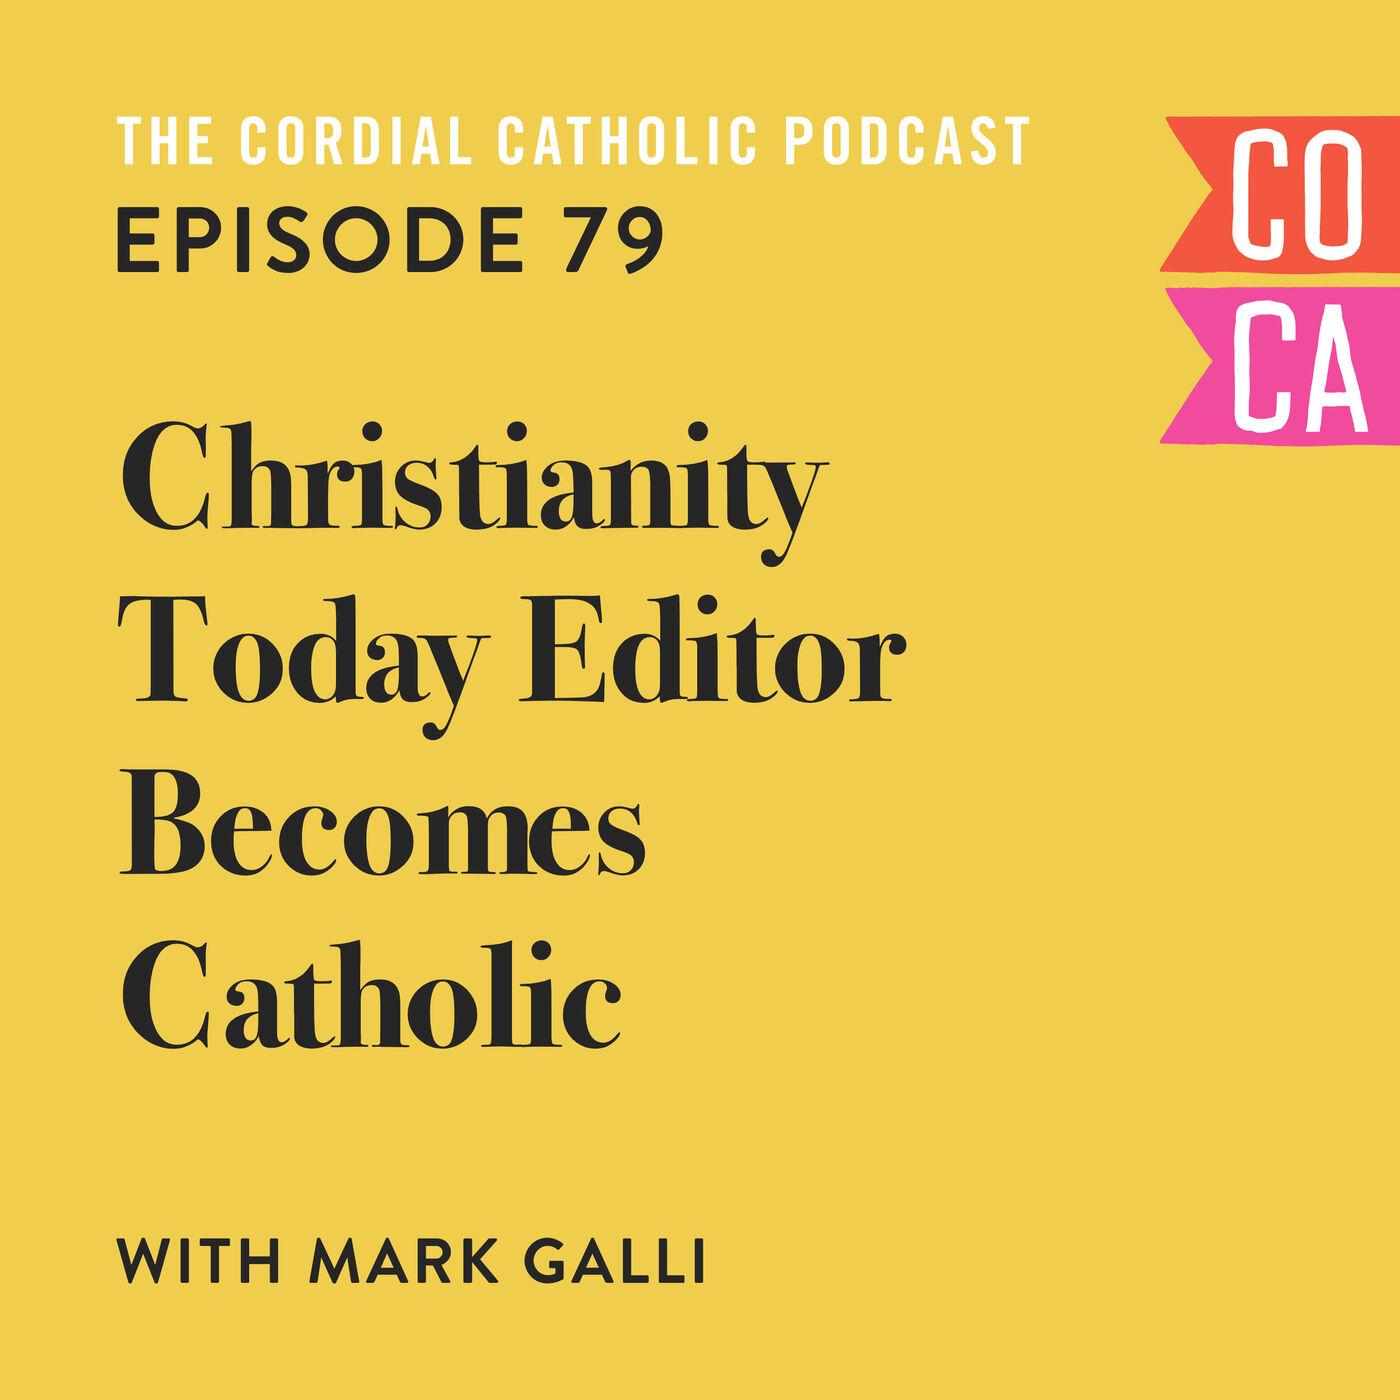 079: Christianity Today Editor Becomes Catholic (w/ Mark Galli)